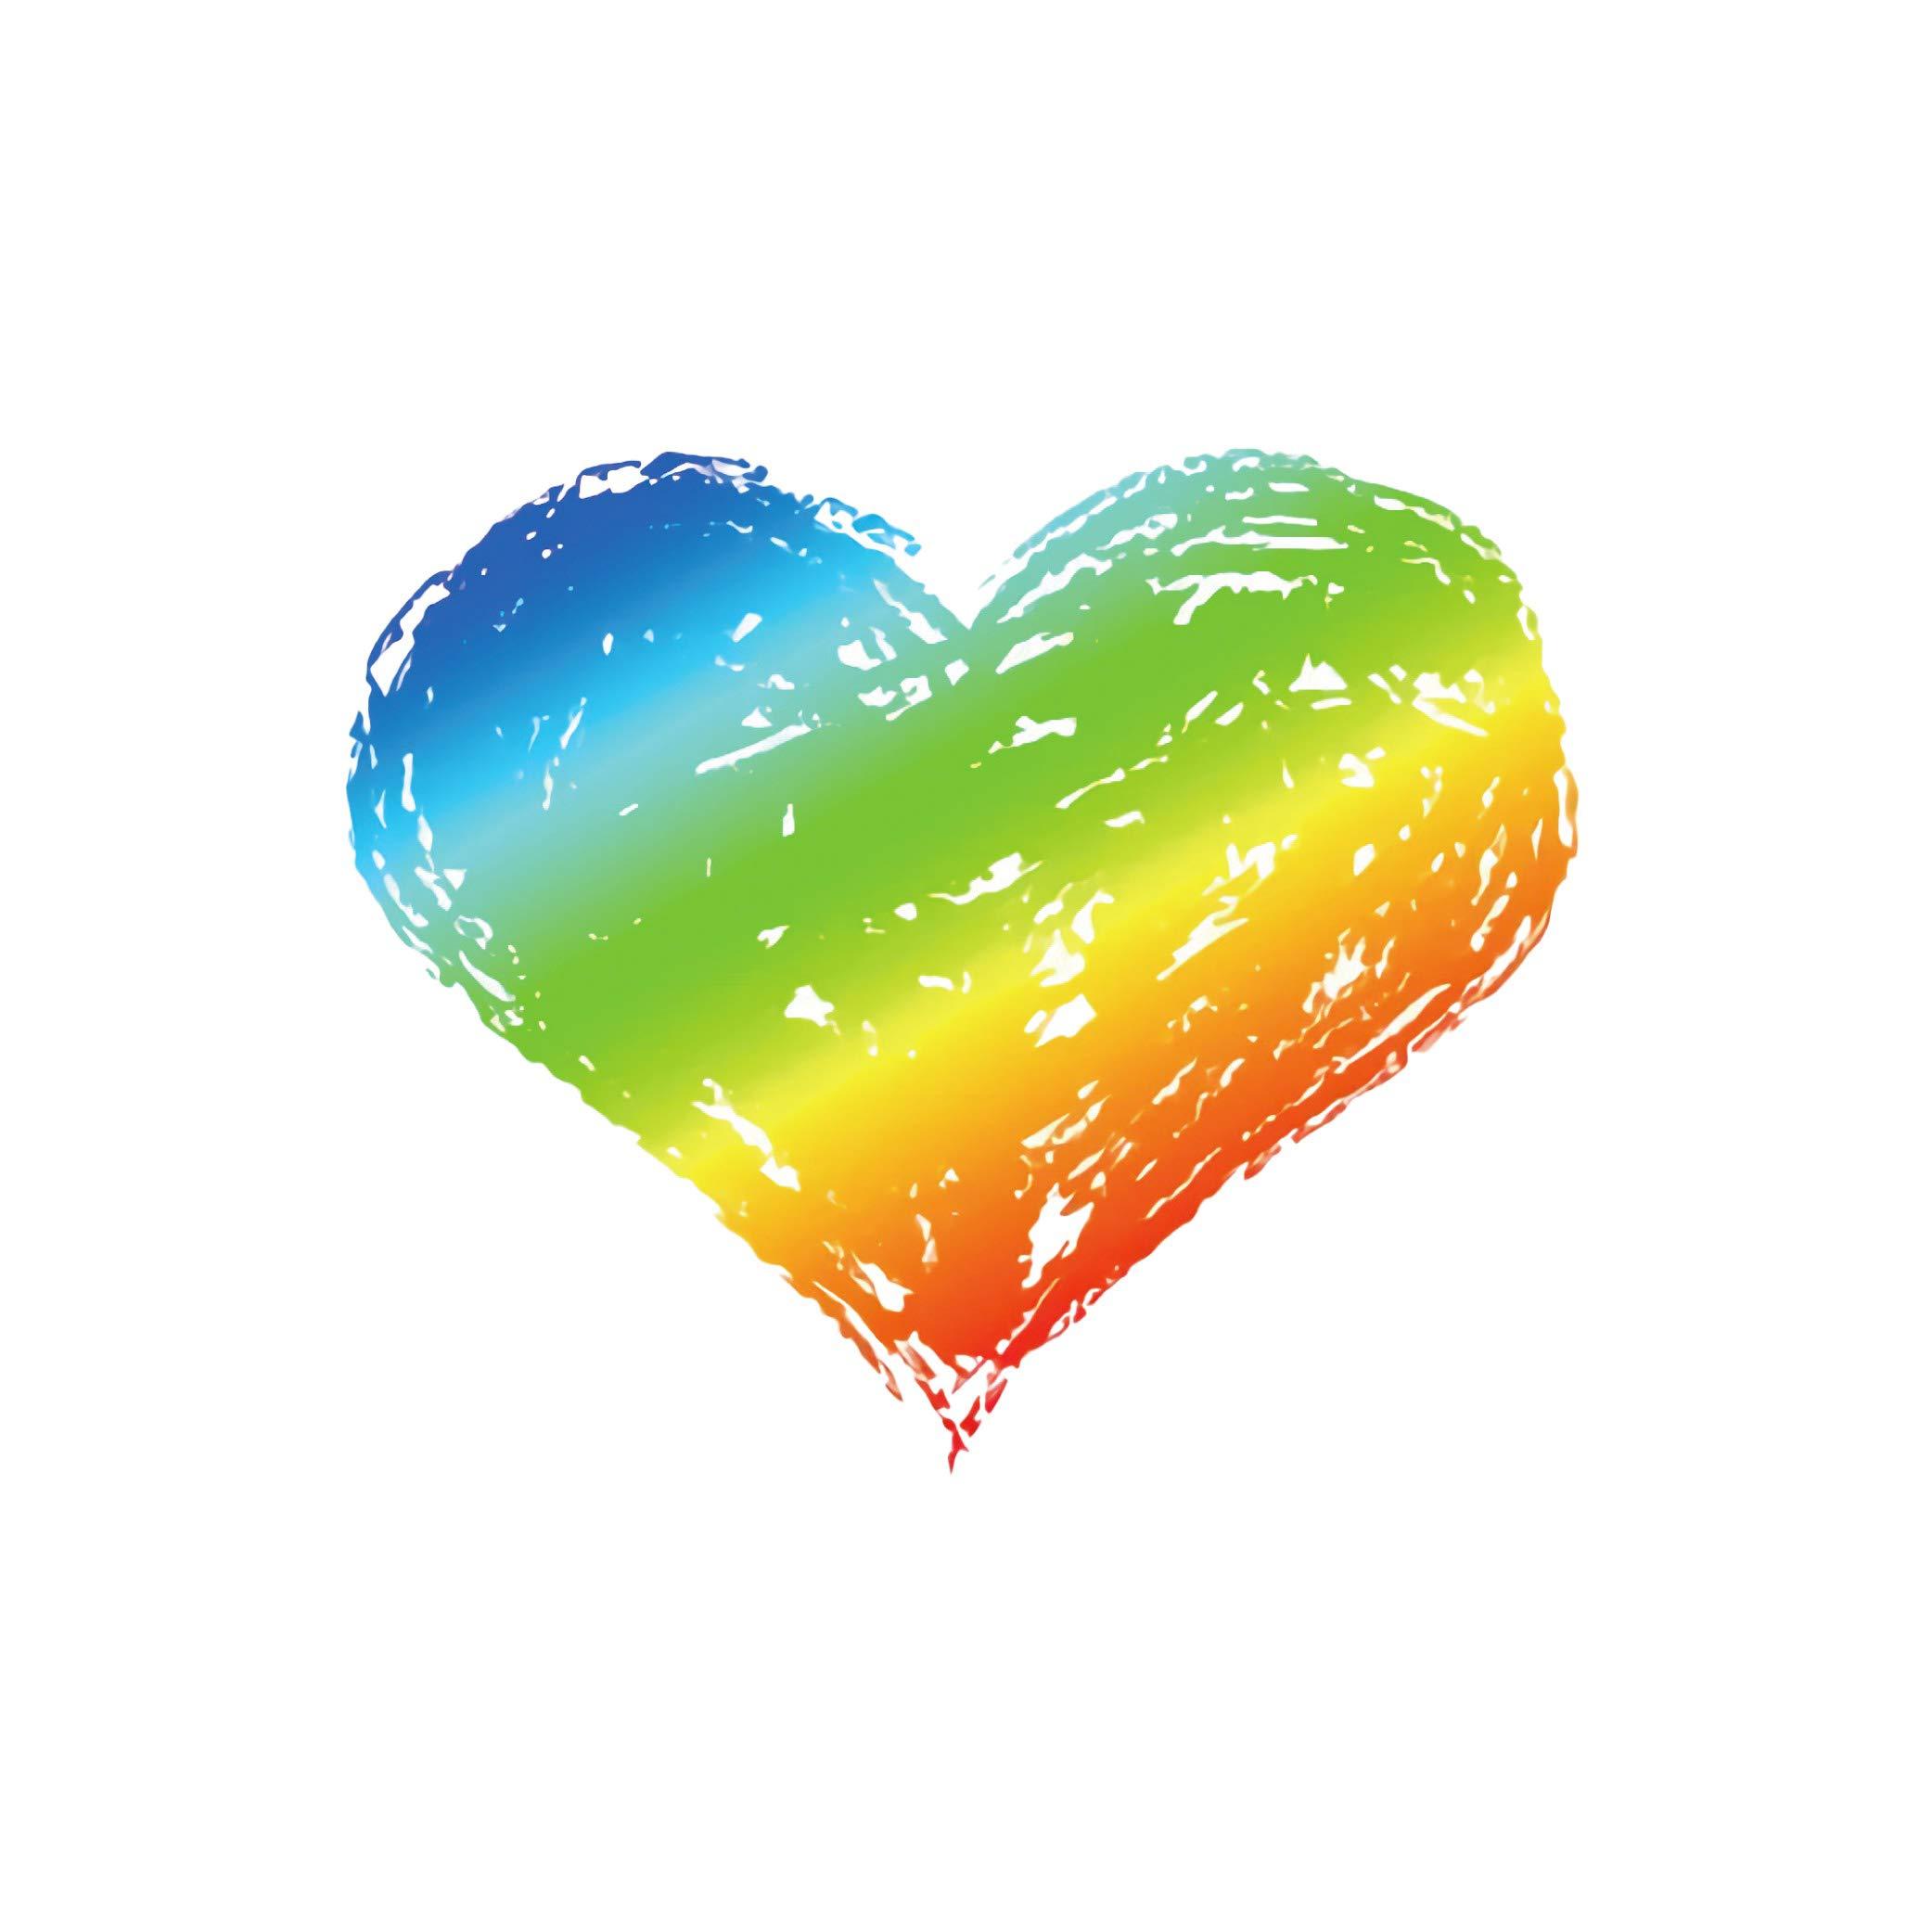 c46bbfb178f94 (6 pack) LGBT Pride Rainbow Heart Decor Temporary Tattoo - Waterproof Cute  Realistic Gay Body Art Stickers ...